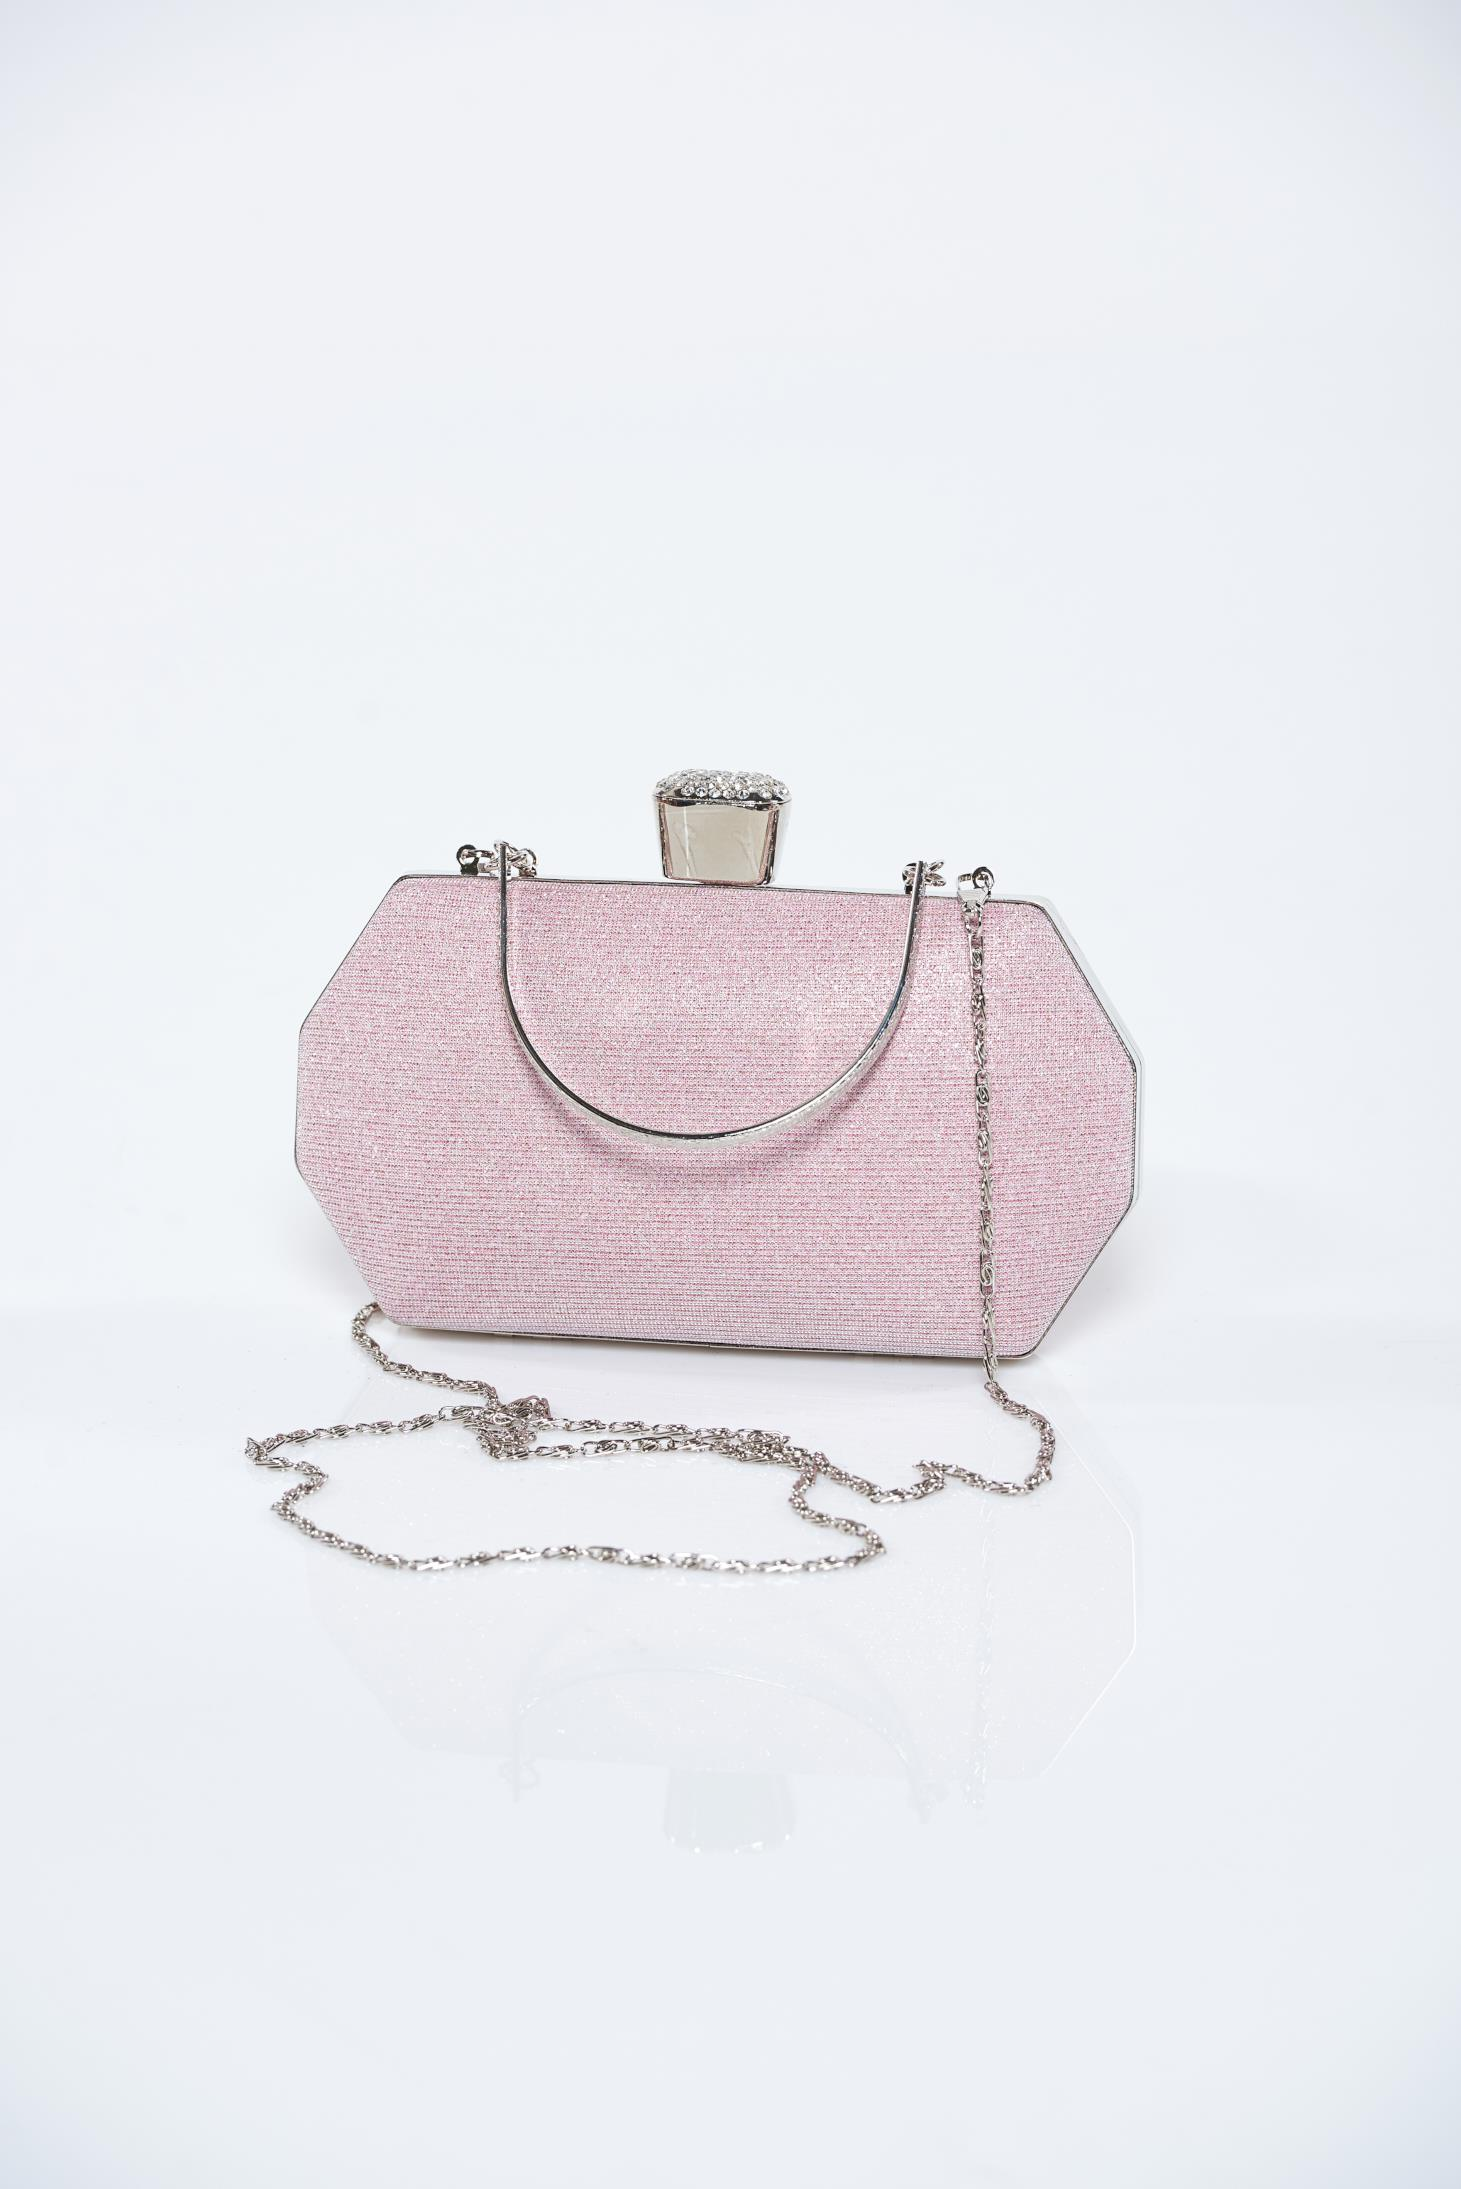 Geanta dama roz deschis de ocazie cu aplicatii cu sclipici